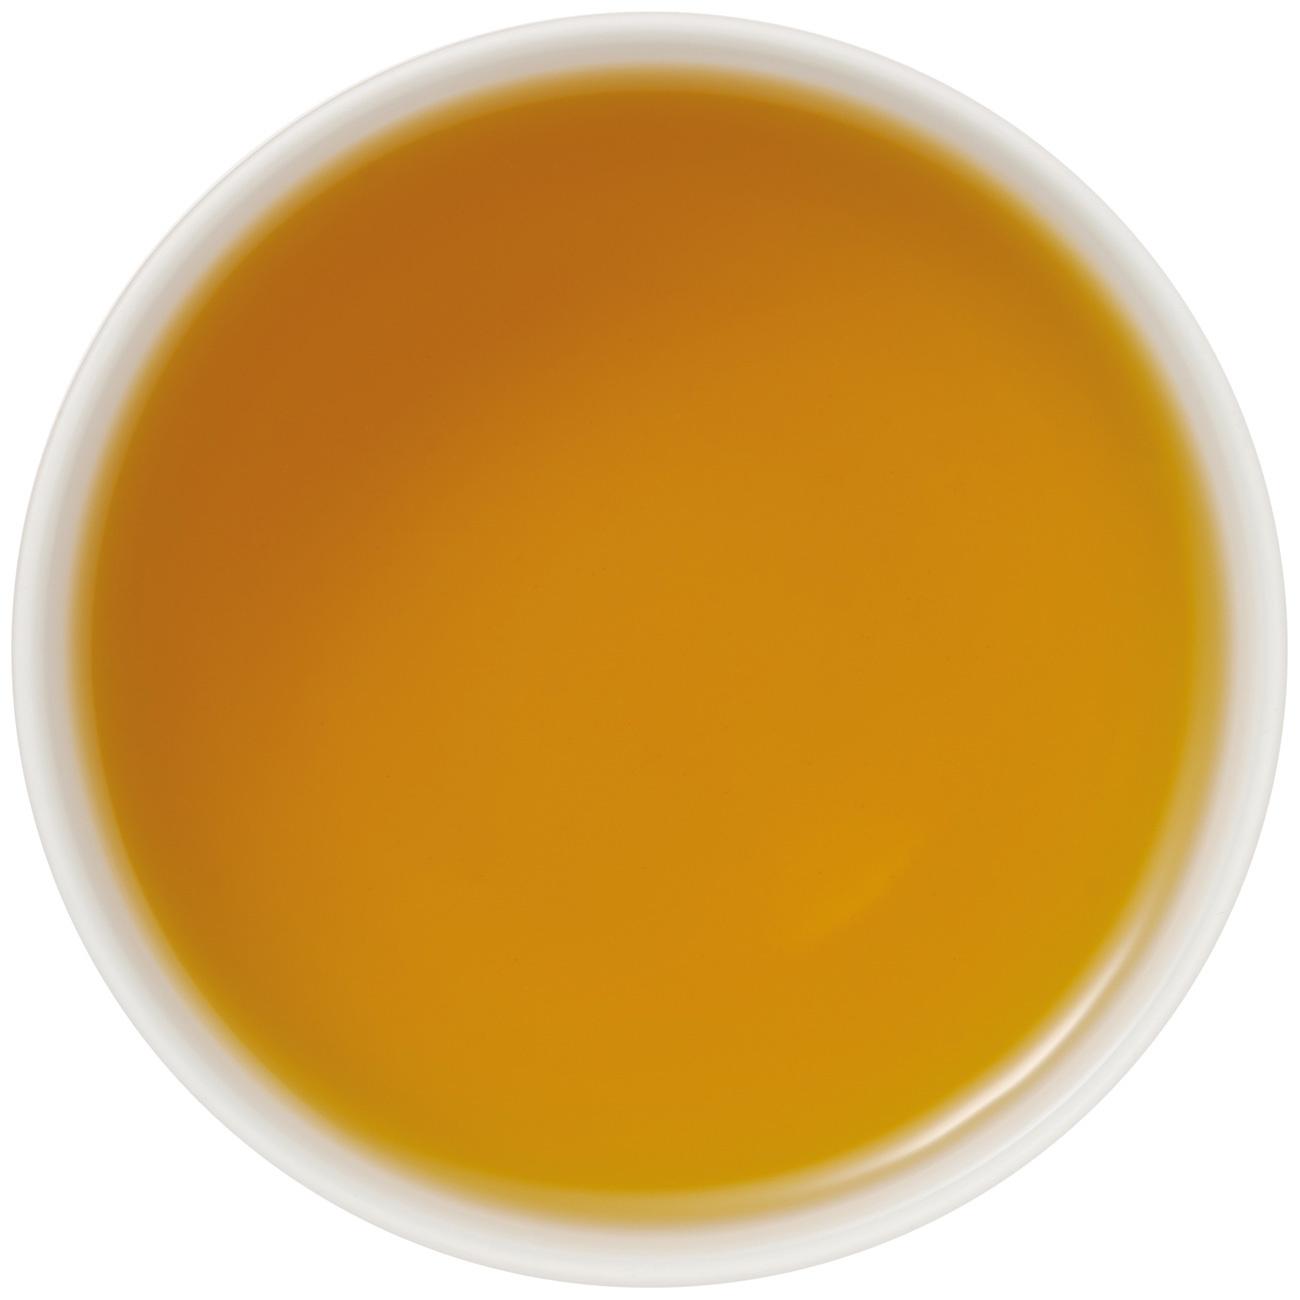 China White Jasmijn Parels-3